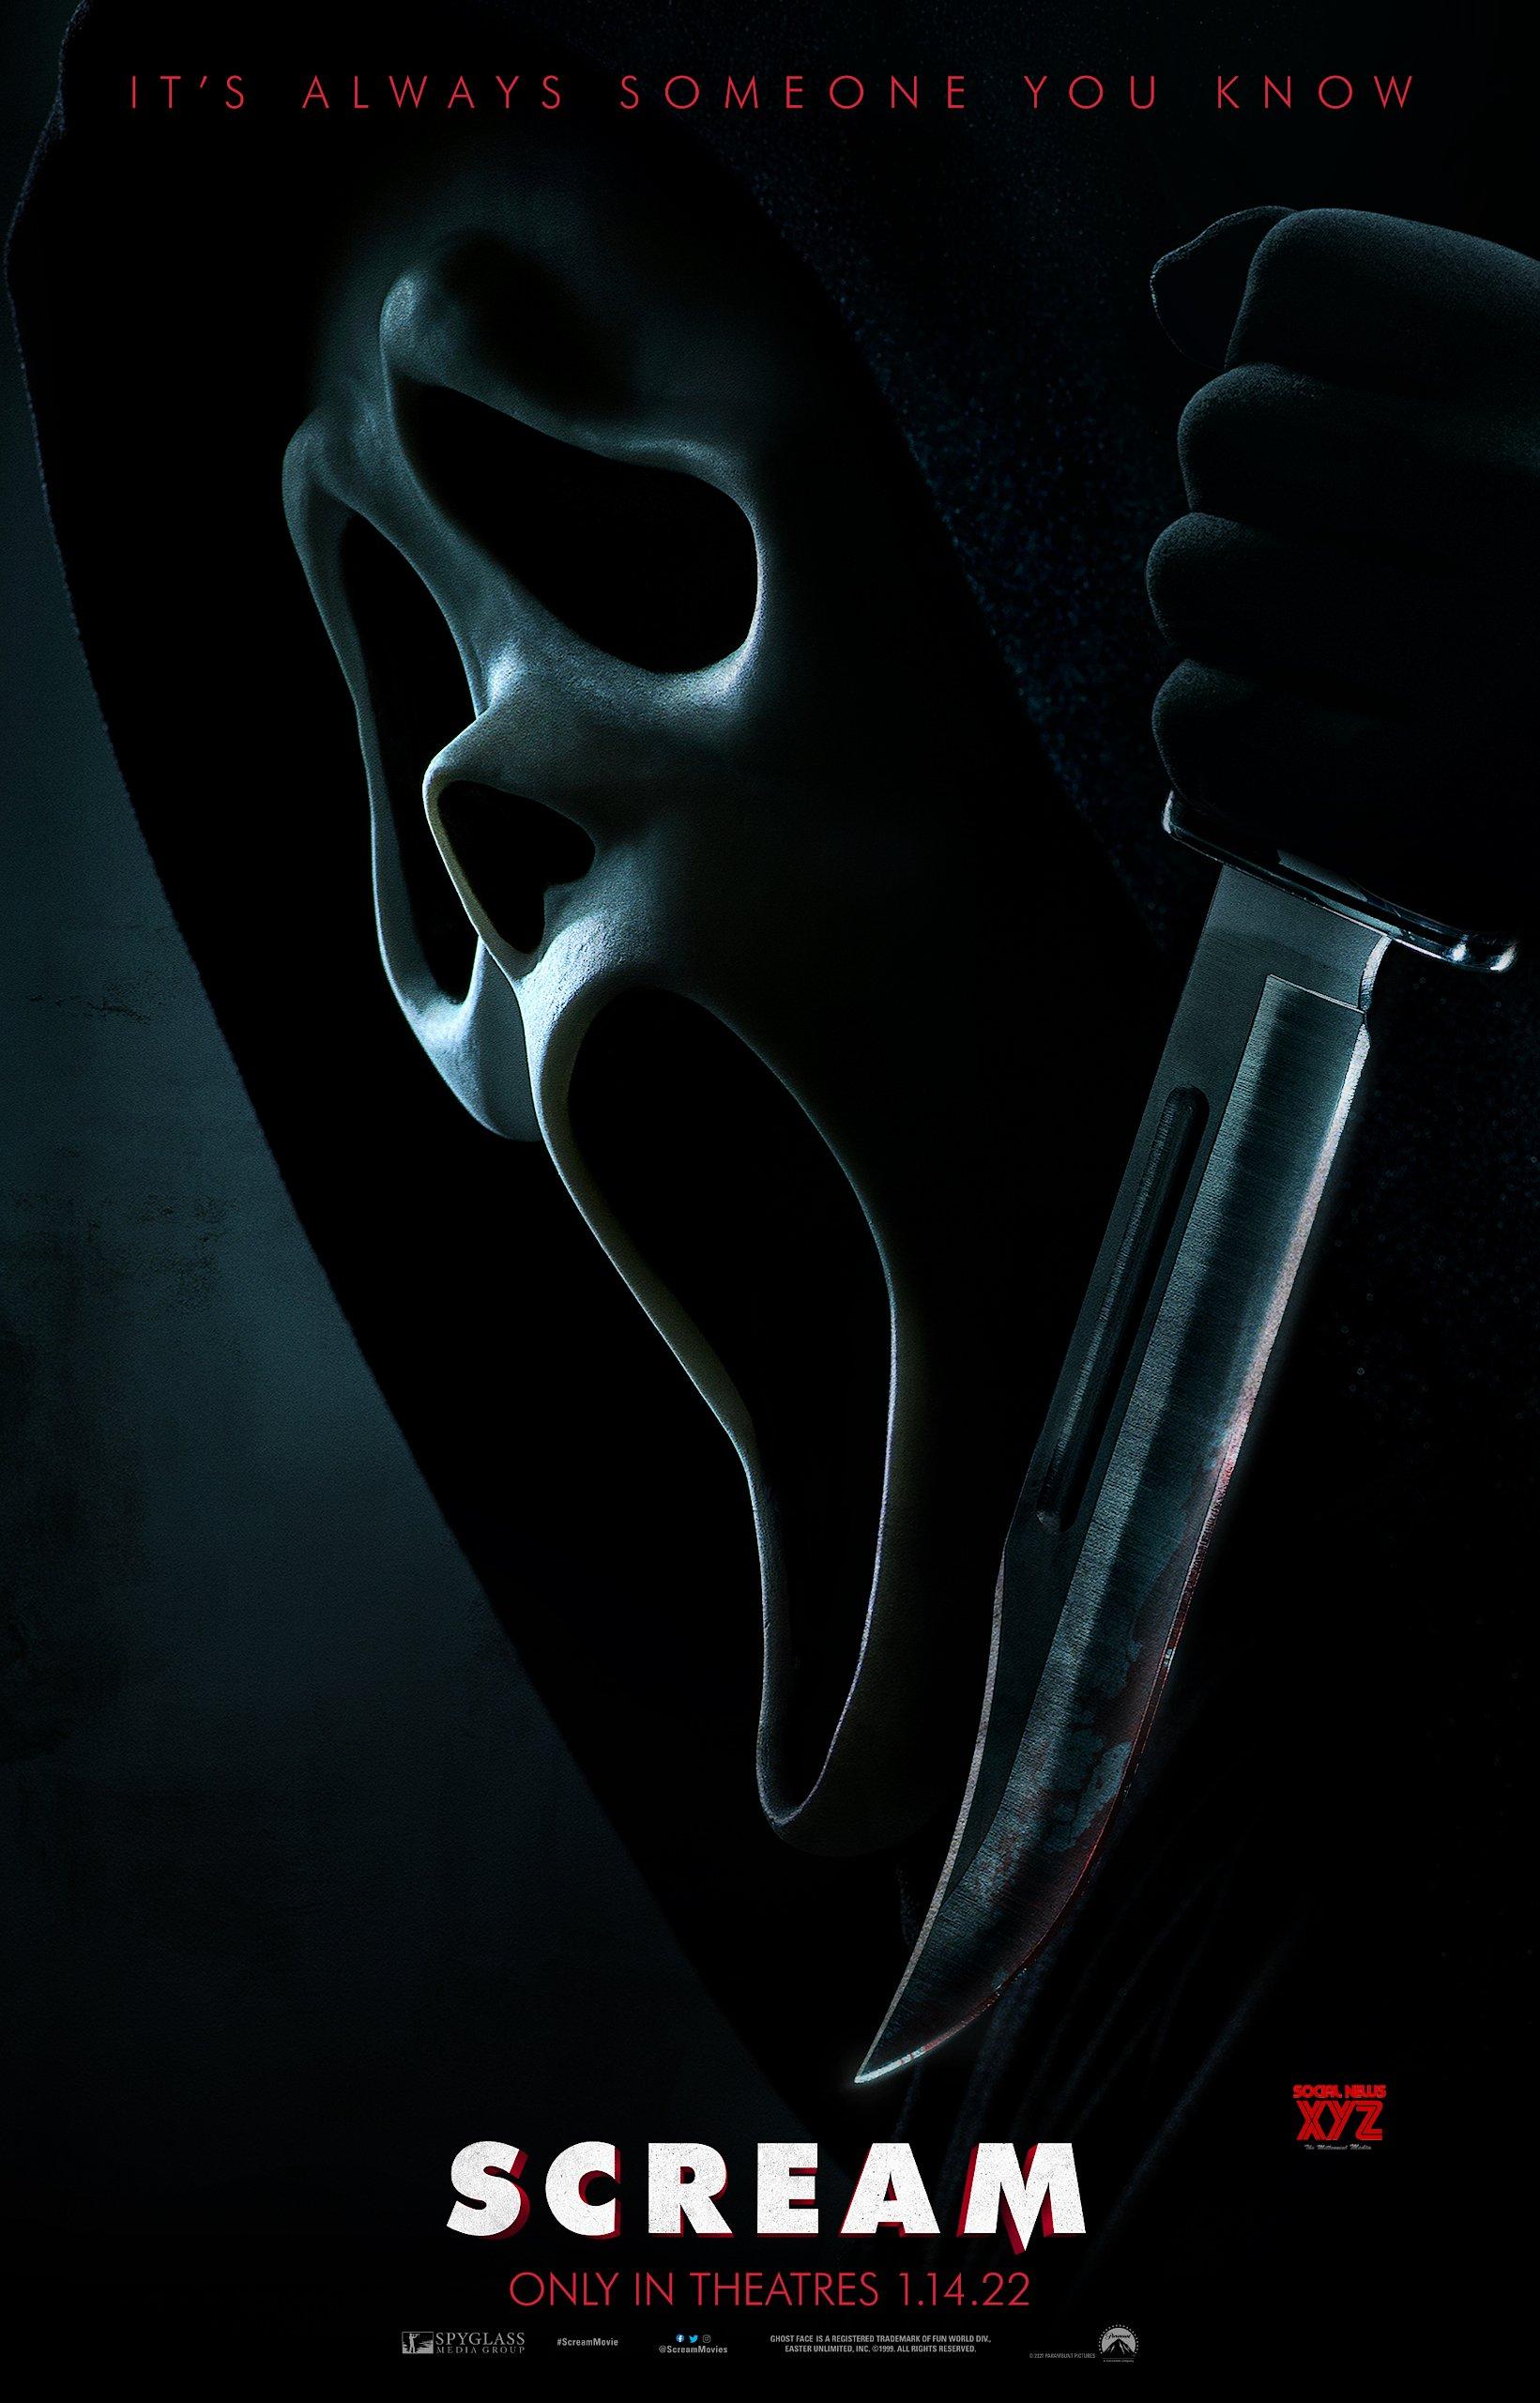 Scream Movie HD Poster